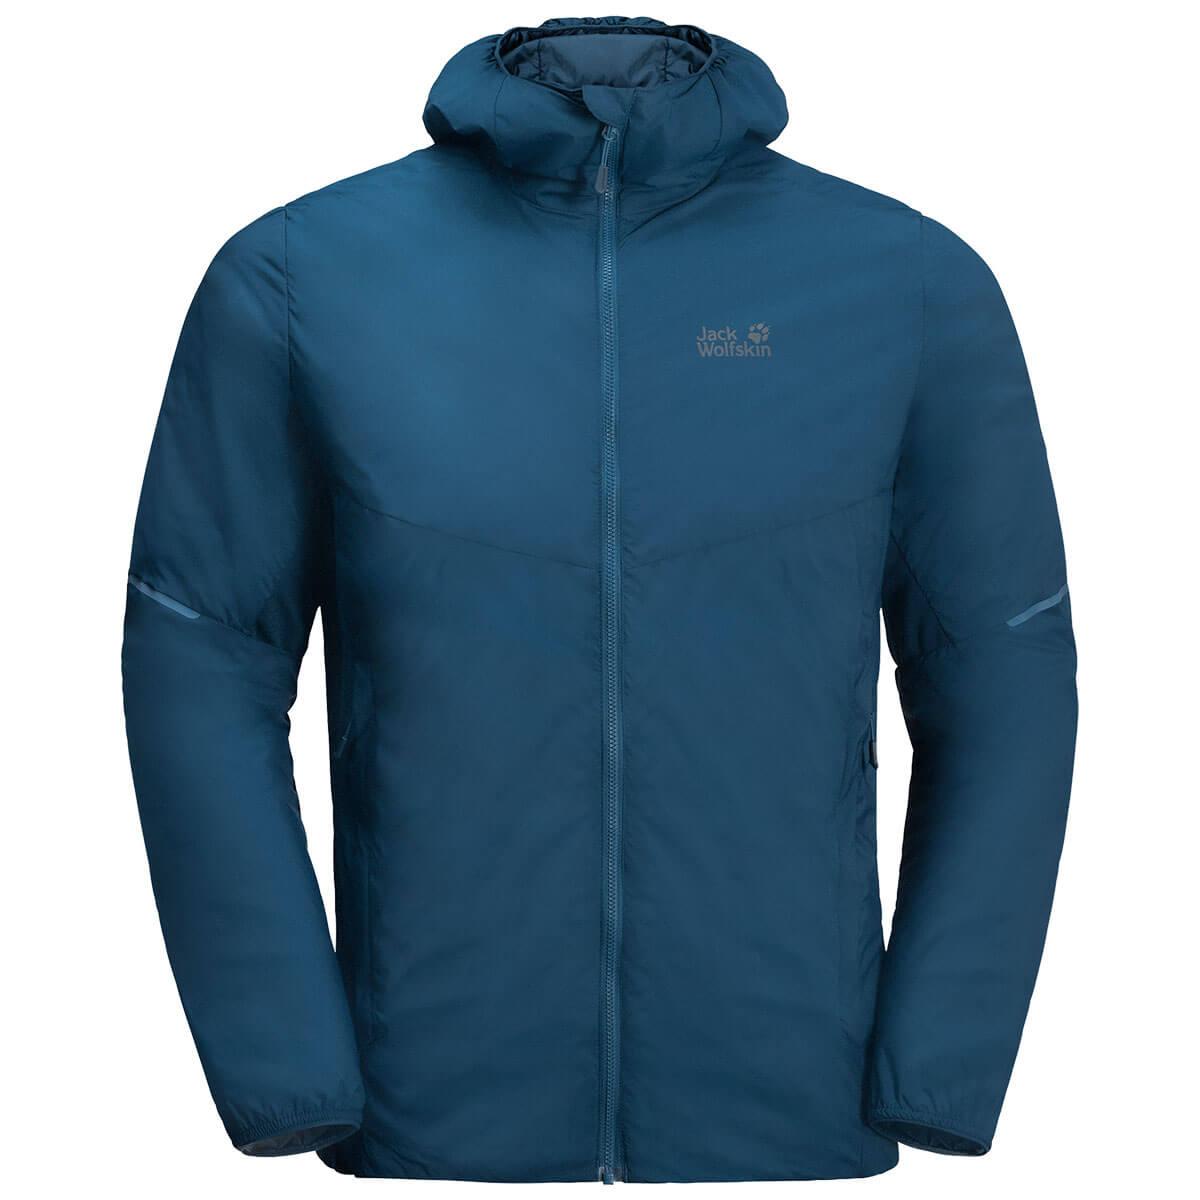 Details about Jack Wolfskin Men's Opouri Peak Jacket